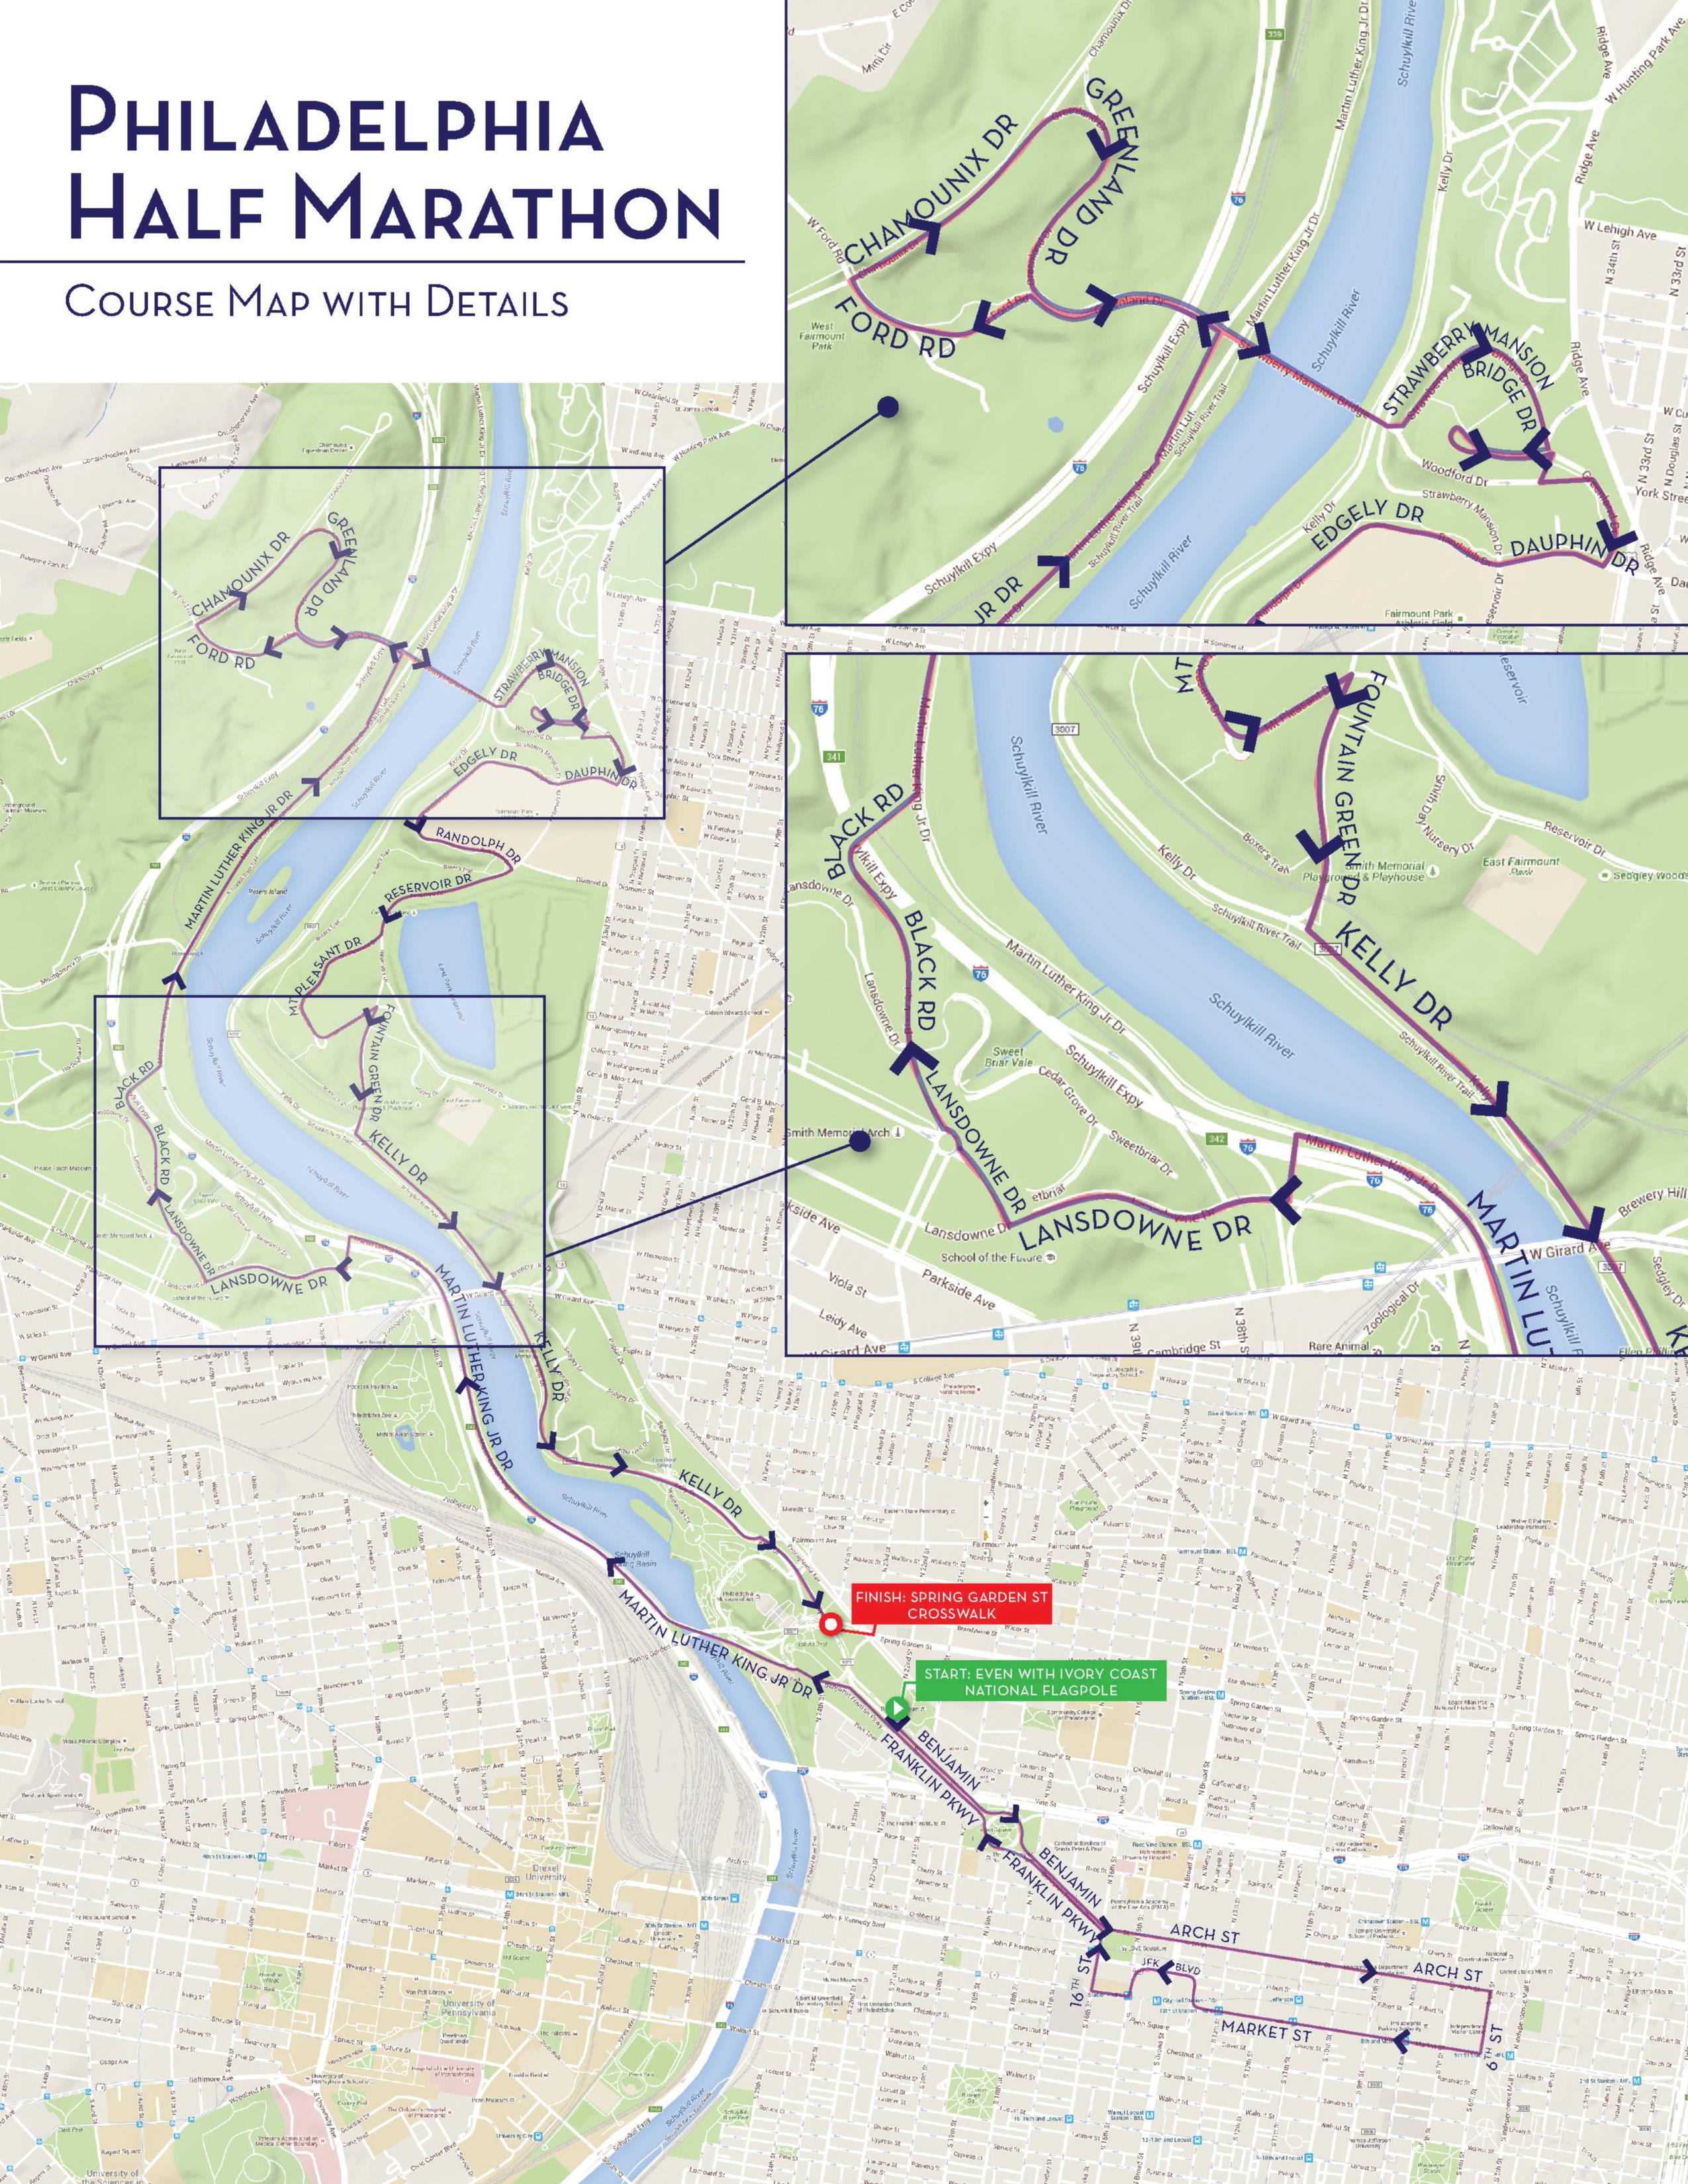 What The Philadelphia Marathon39s Half Marathon Course